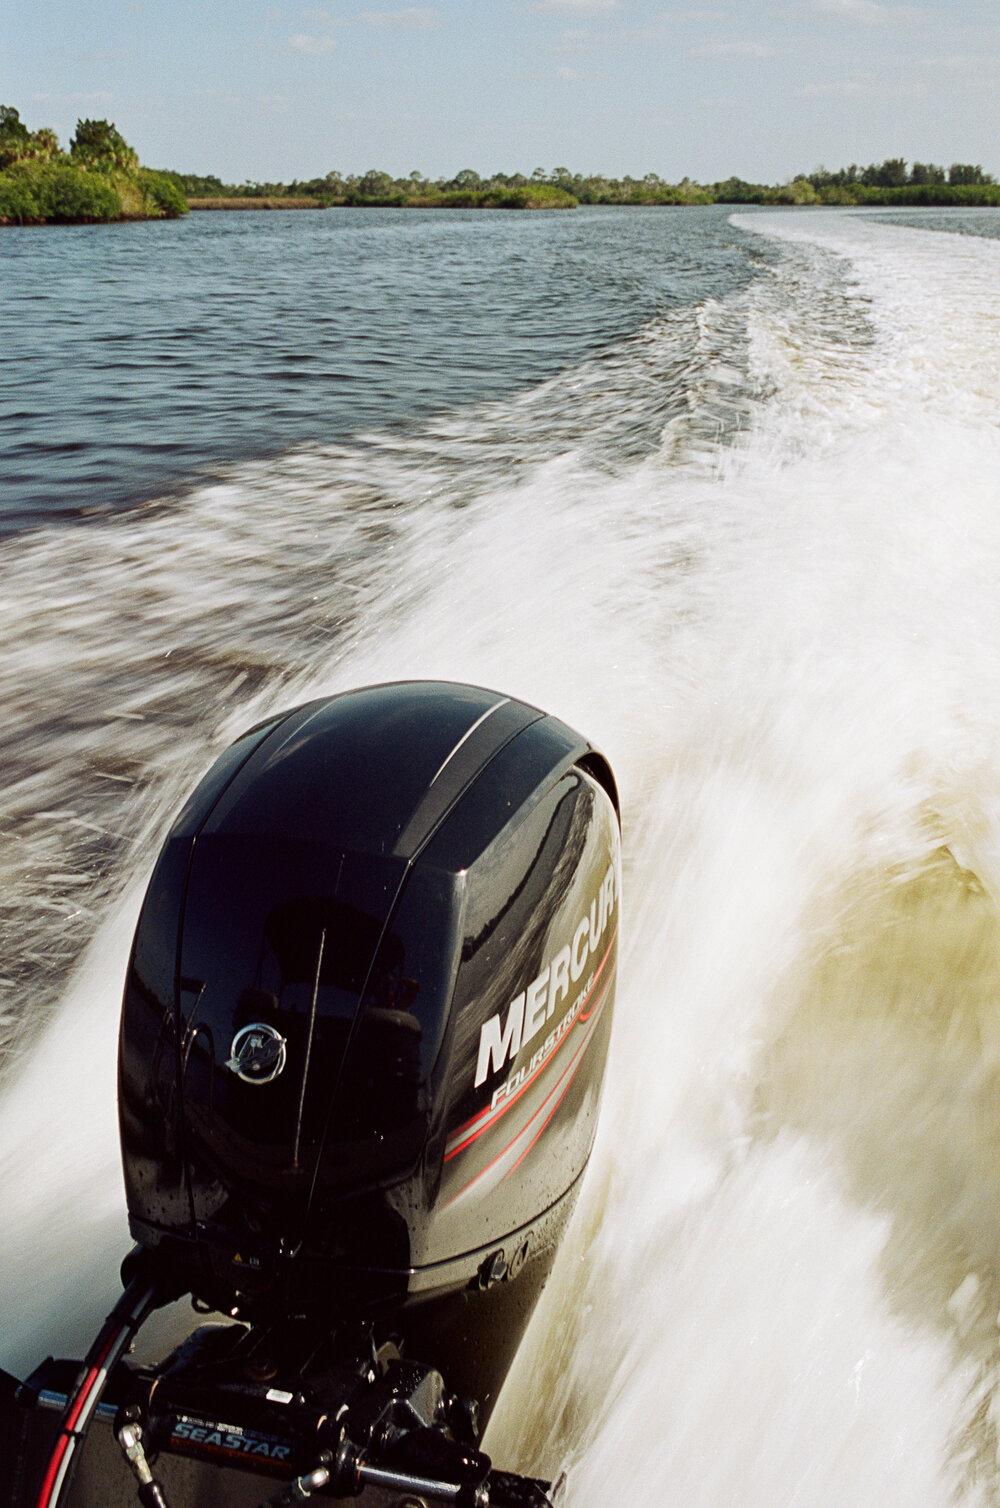 09-Boating-Friends-Leica-M6-24.jpg